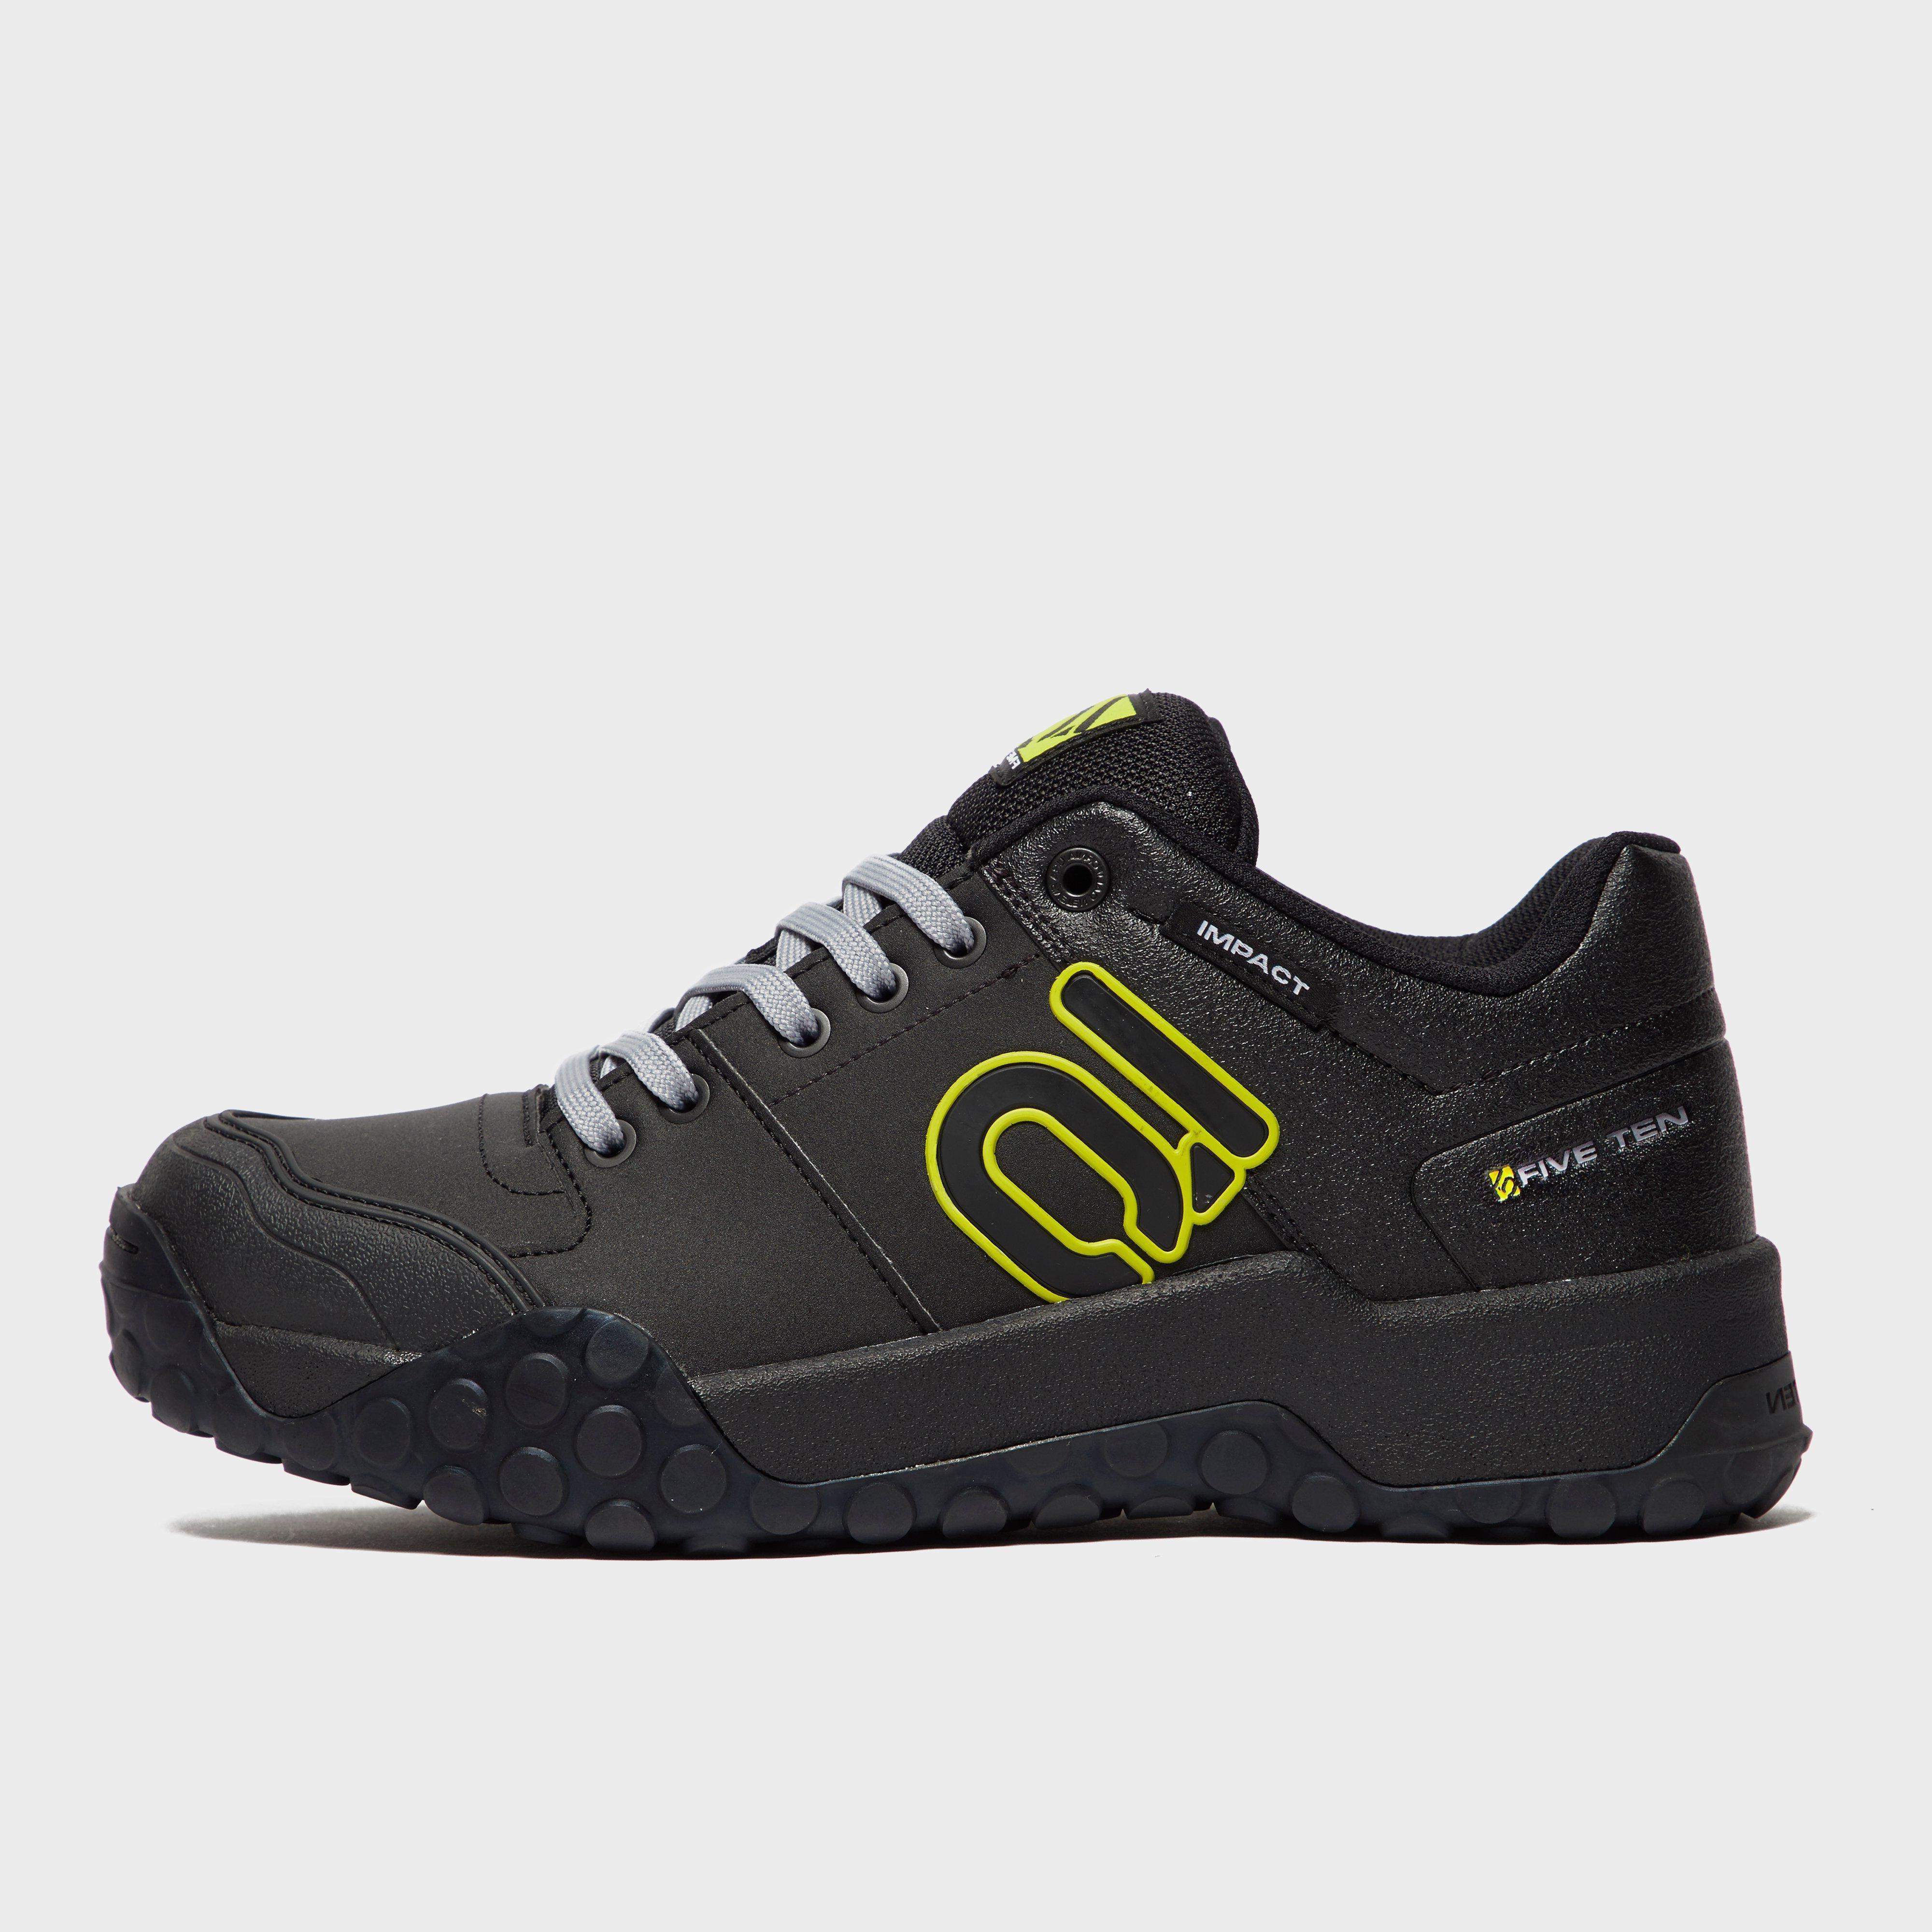 Adidas Five Ten Adidas Five Ten Unisex Impact Sam Hill Shoes - Black, Black